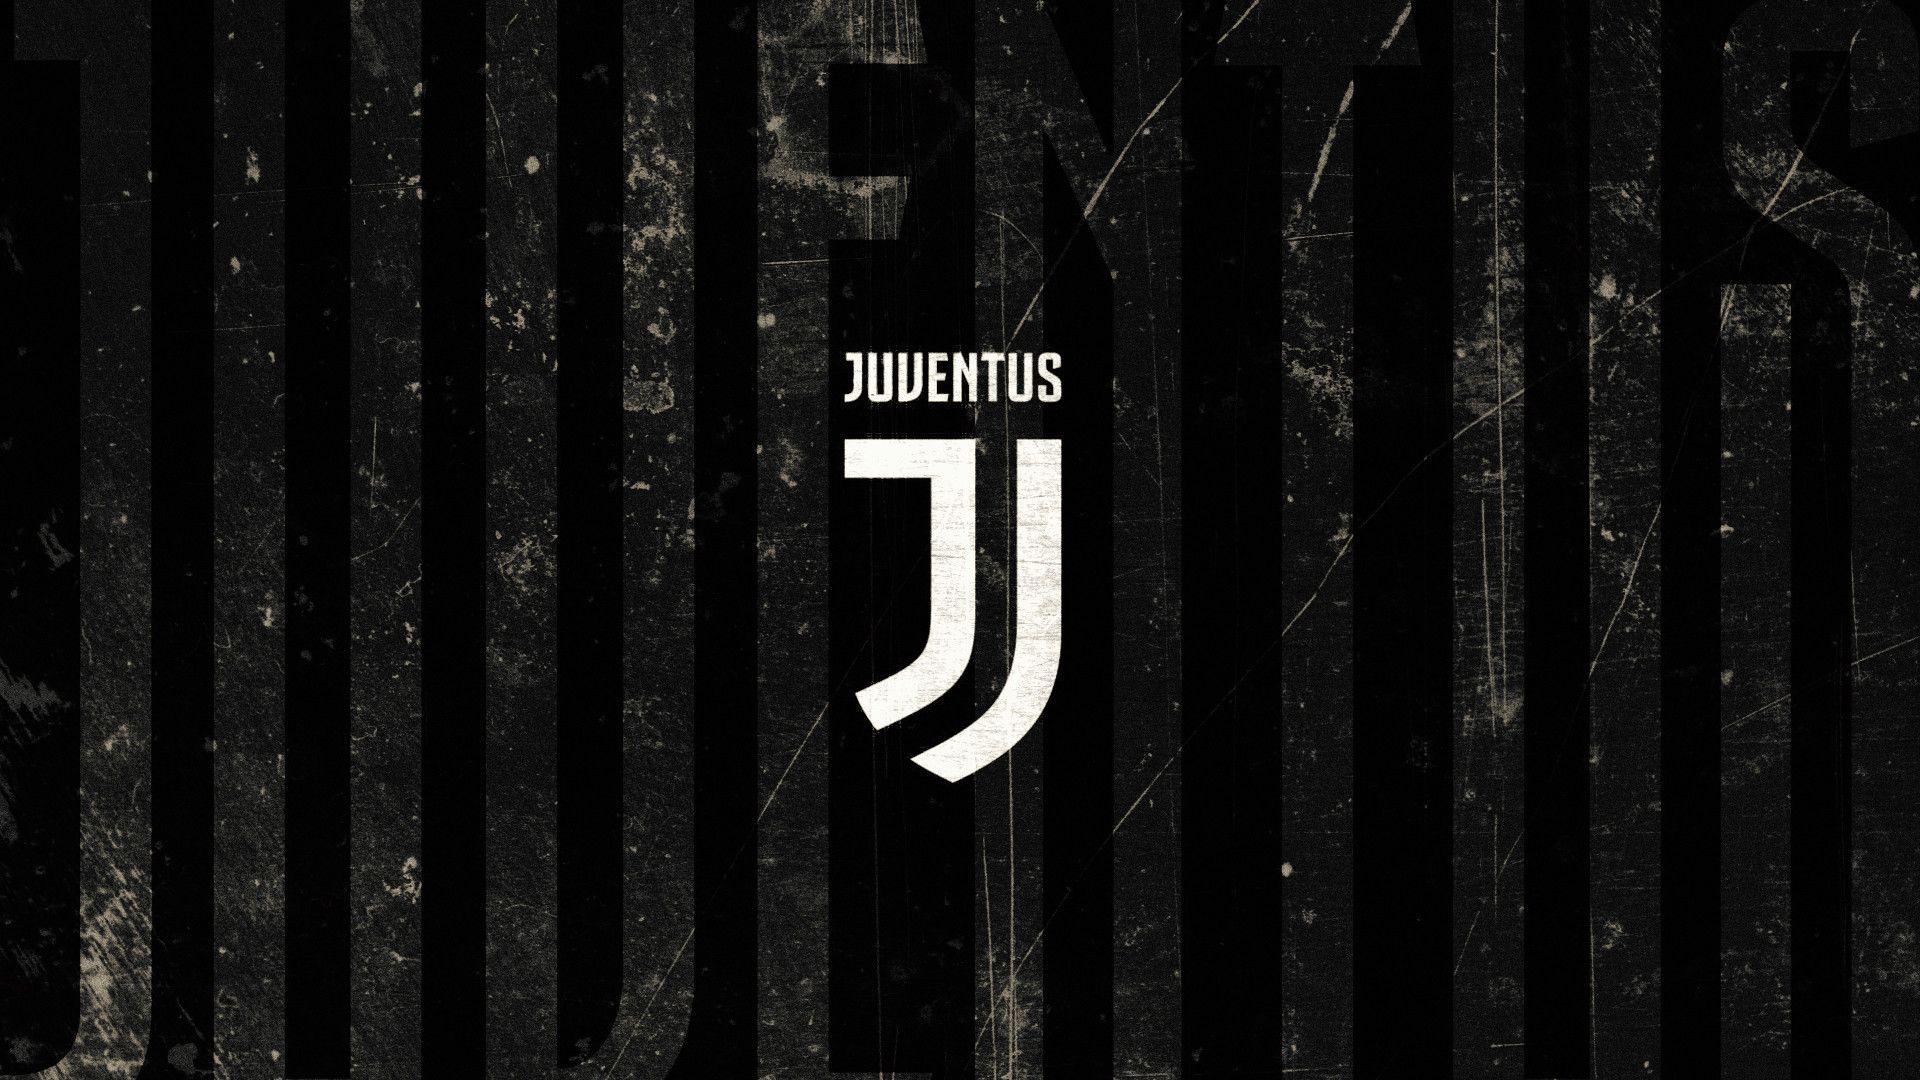 New Logo Juventus Wallpaper 19201080 Hd Wallpaper Wallpaper Brand